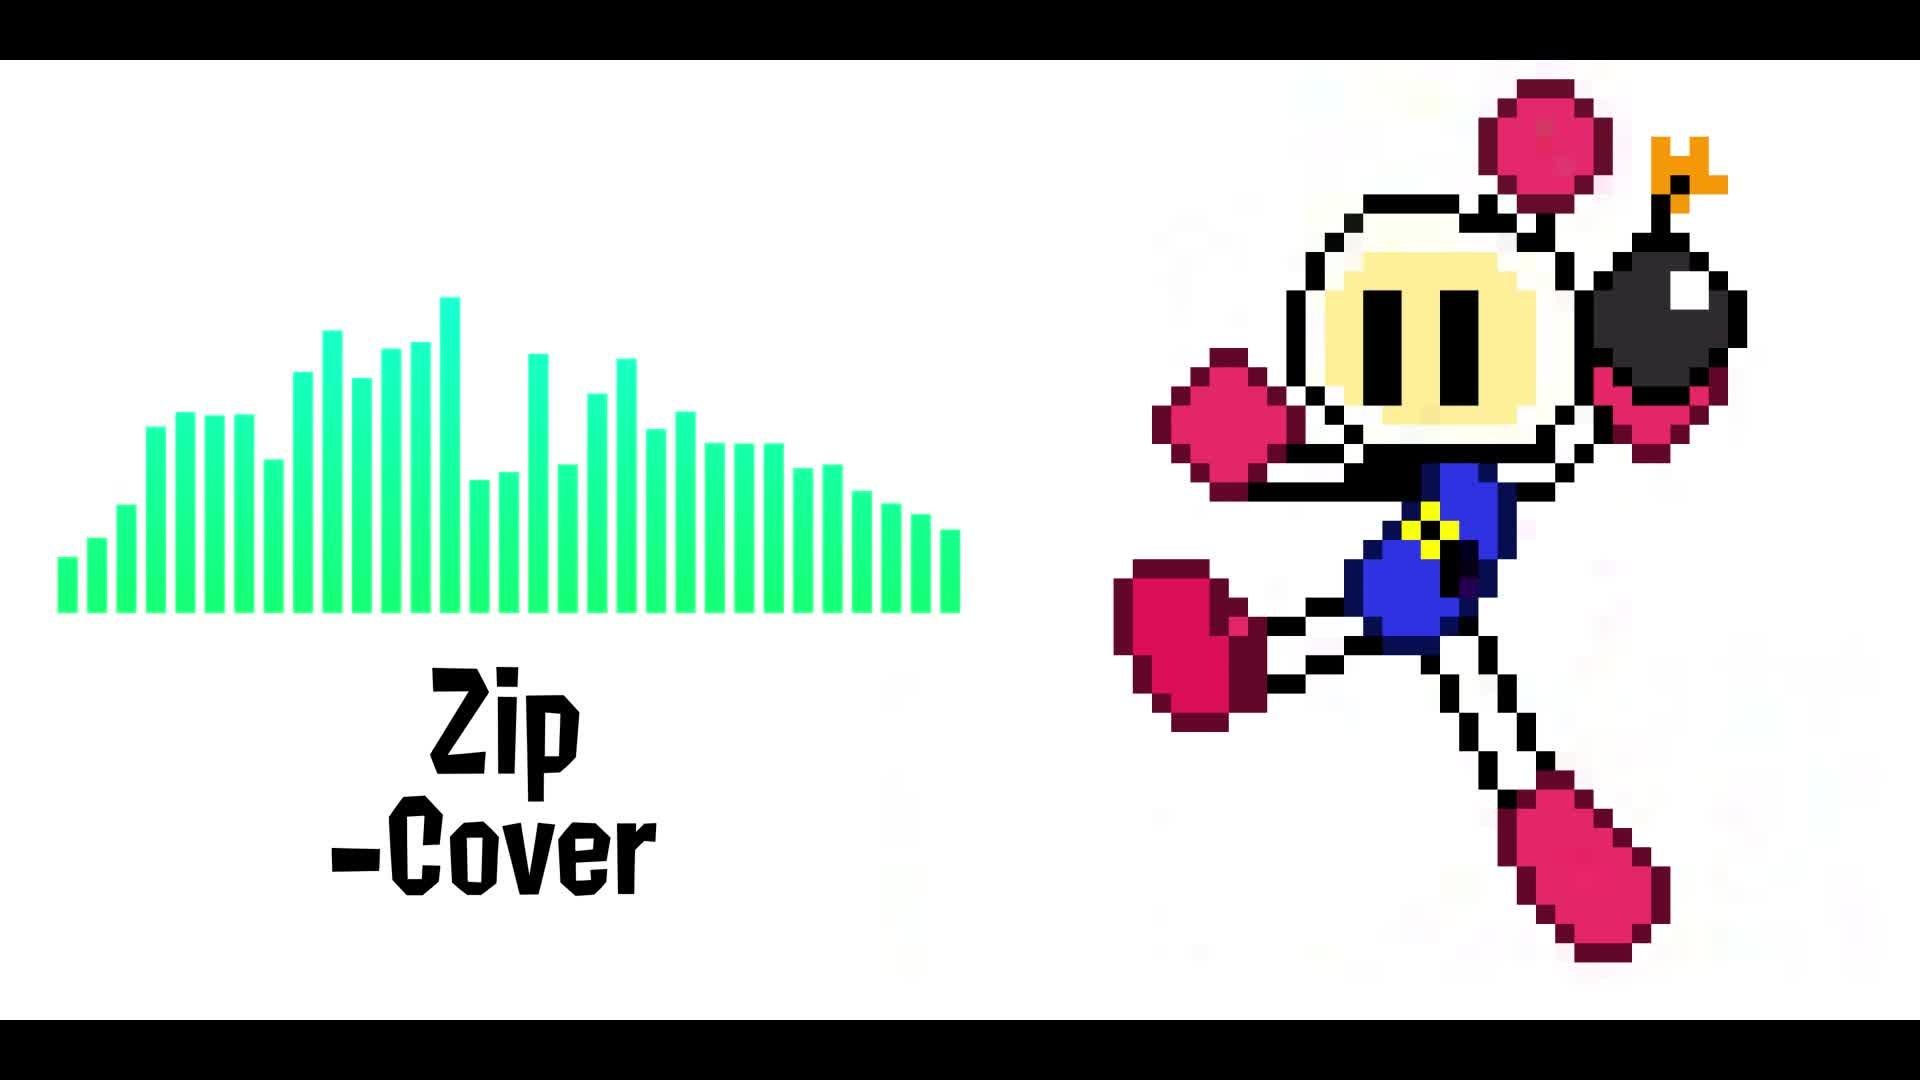 Entertainment: Music - Zip(Bomberman Hero)-cover video cover image 1